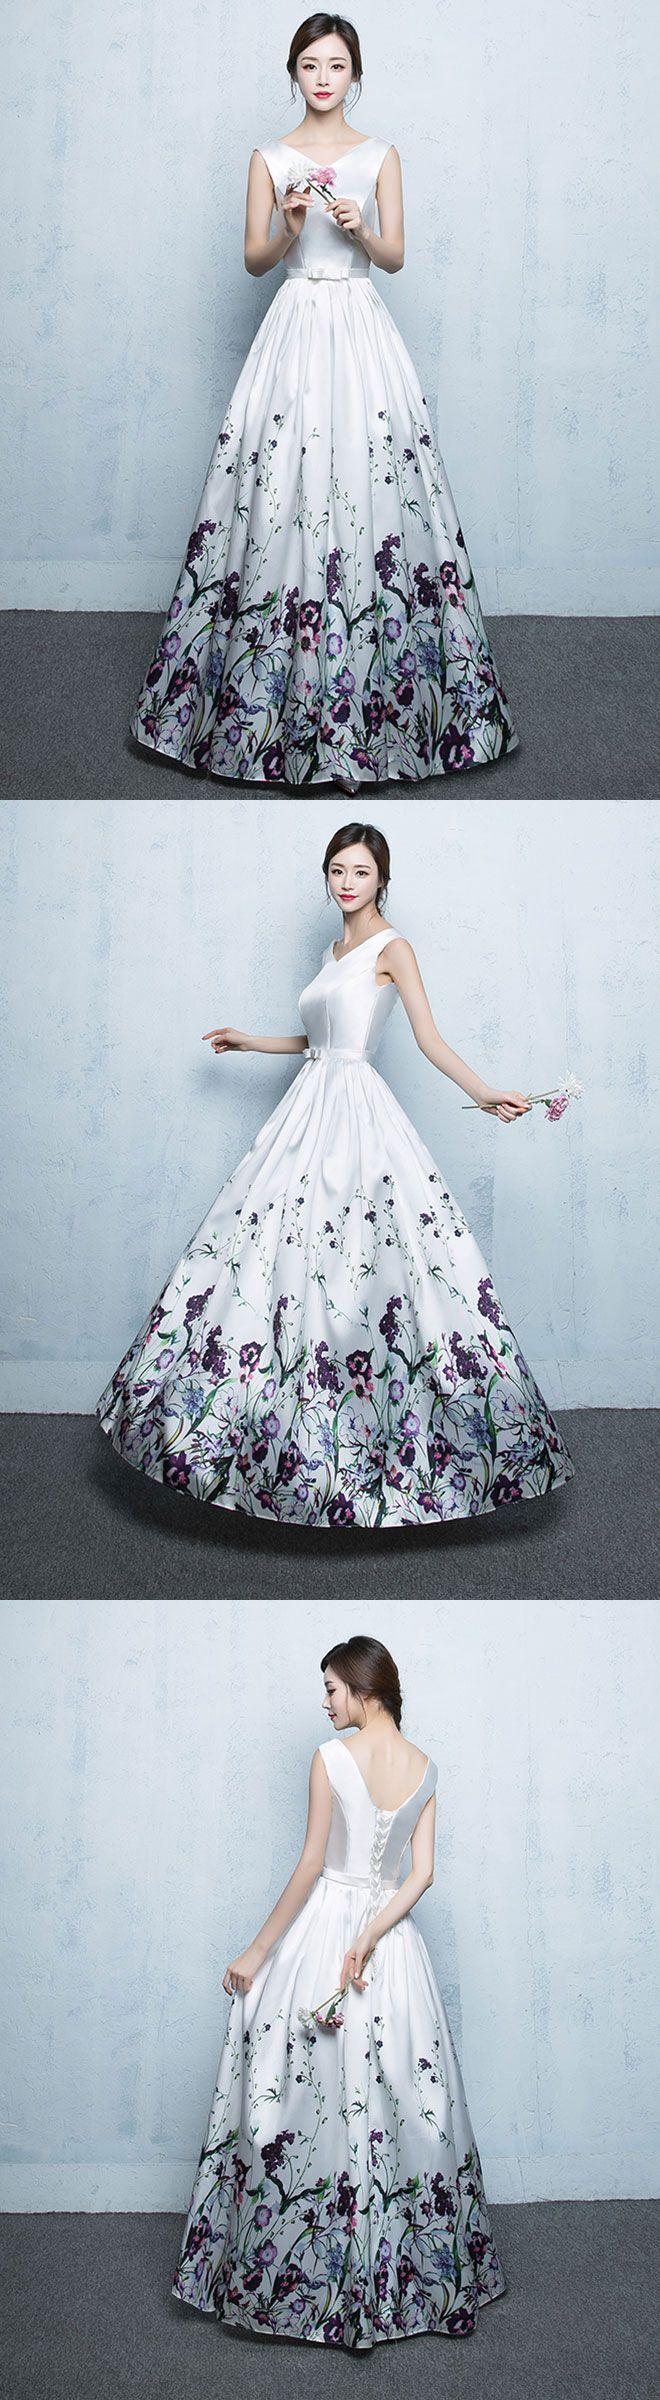 White floral pattern long prom dress white evening dress long